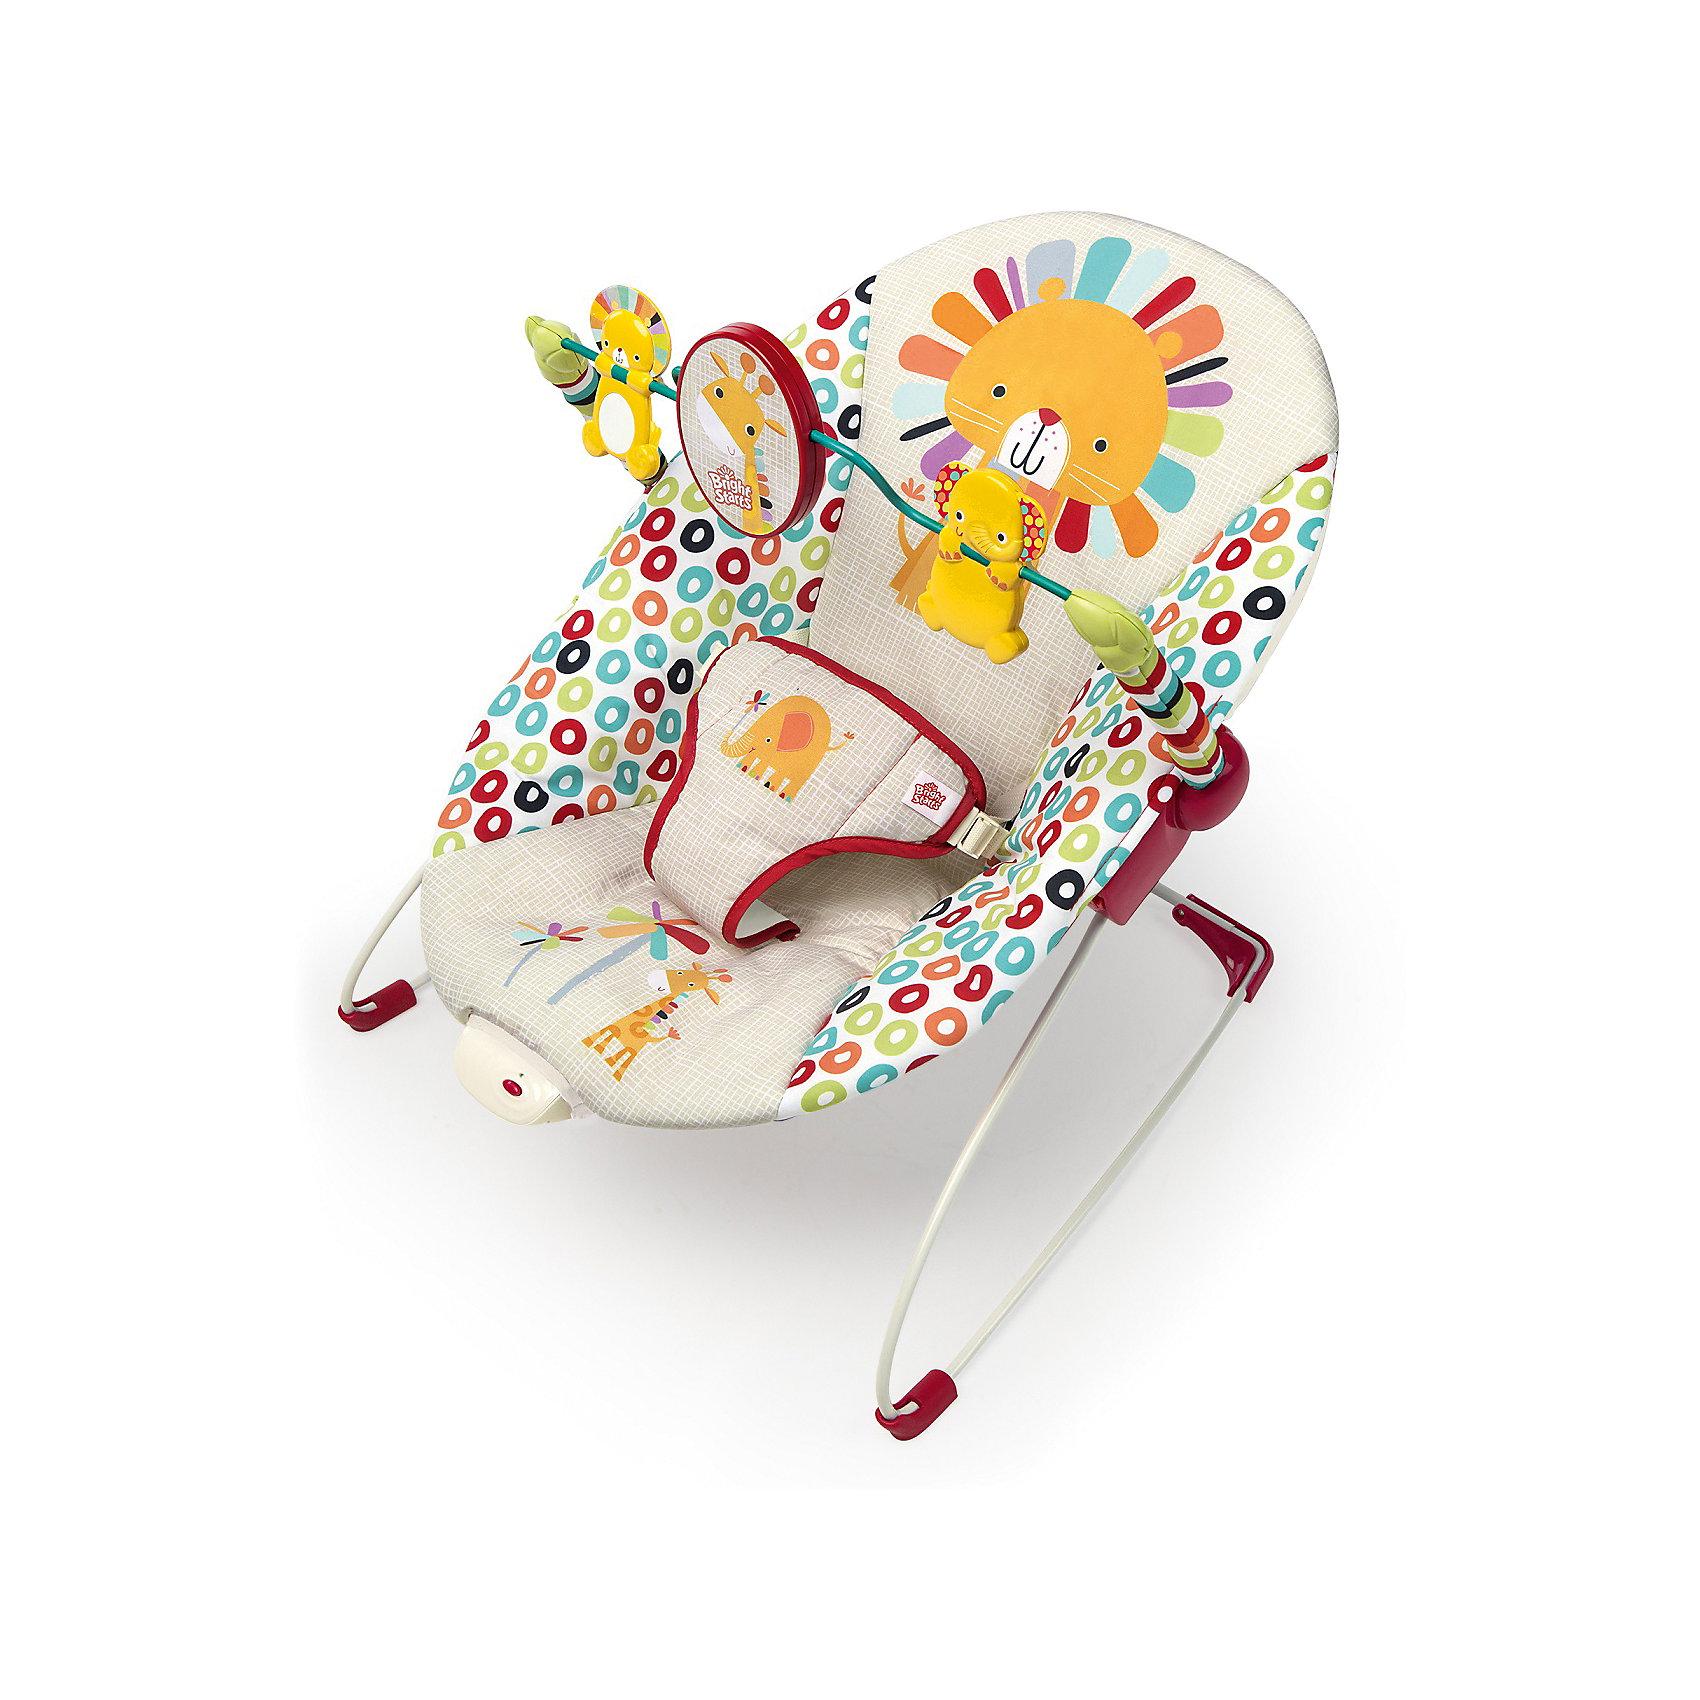 Bright Starts Кресло-качалка Веселые джунгли, Bright Starts детские кроватки kitelli kito orsetto качалка